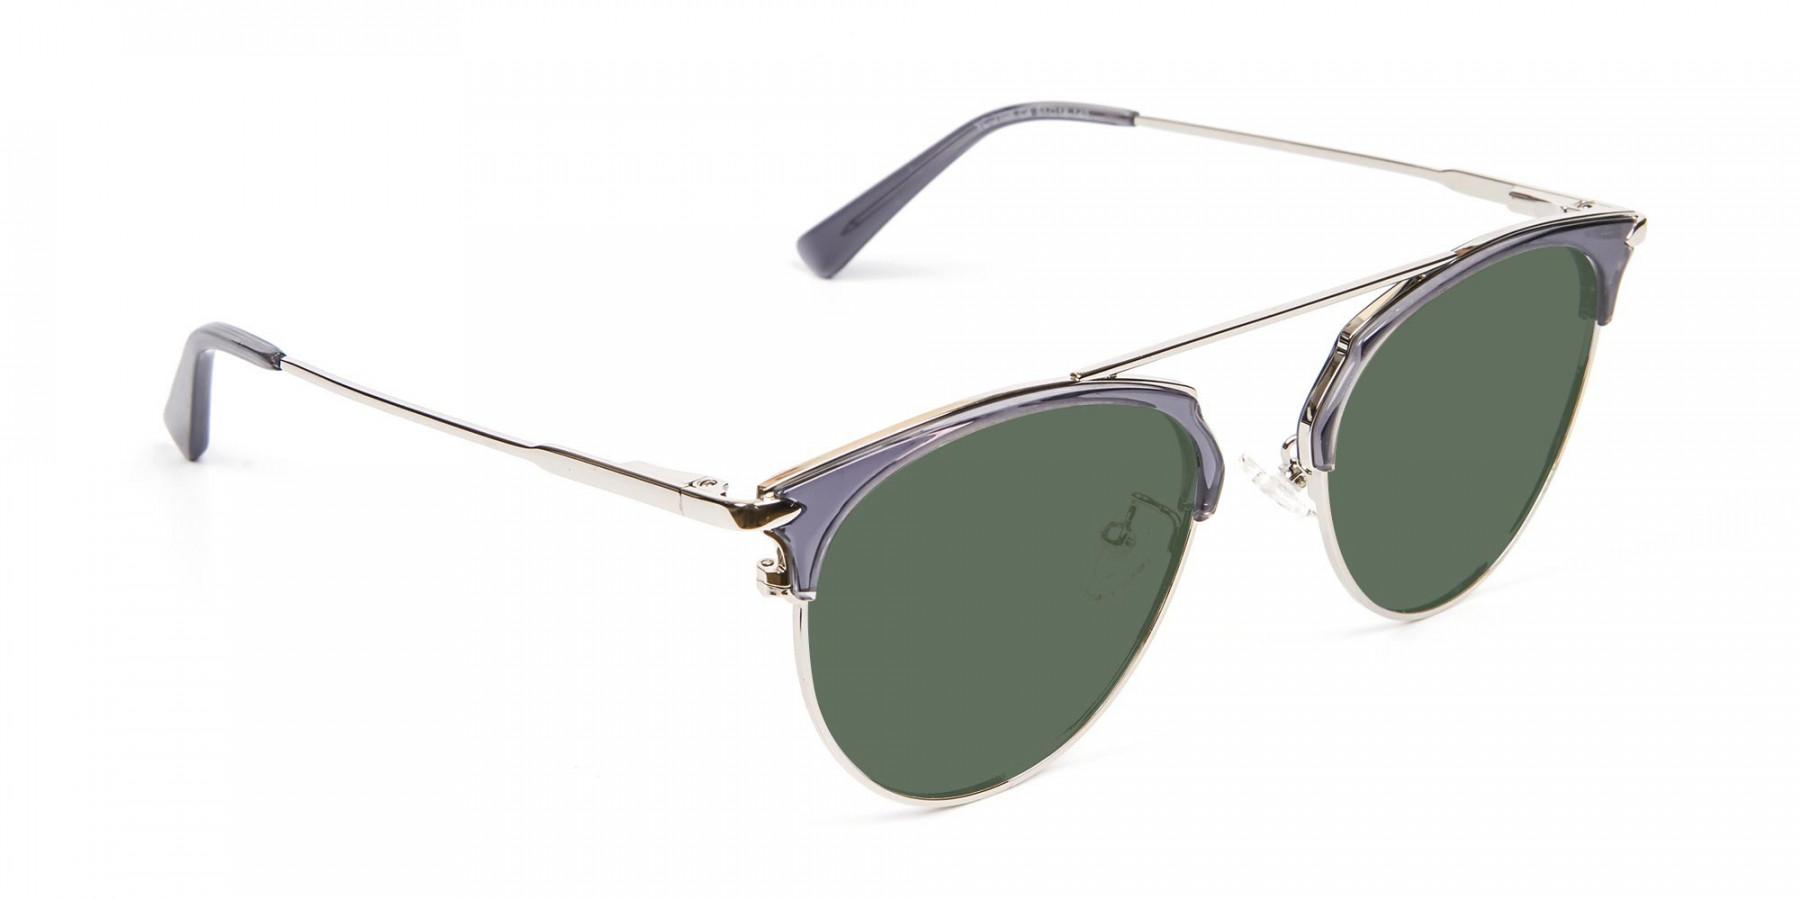 Translucent Frame Sunglasses - 3